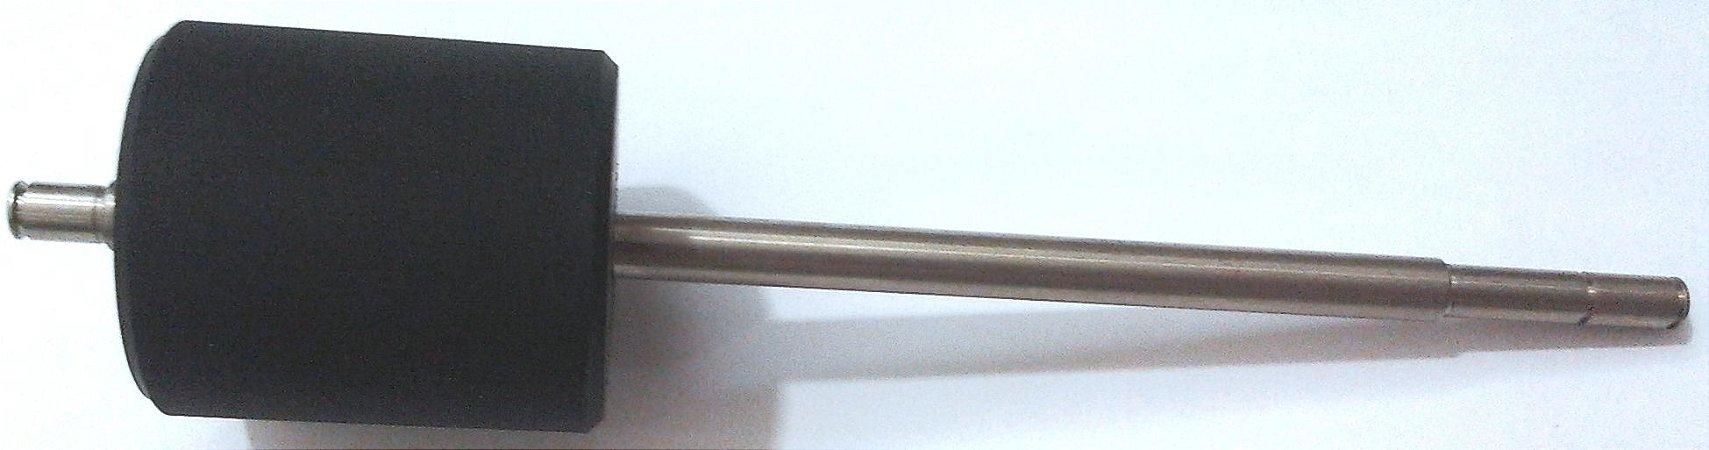 27-656-0225A110 - Rolo Alimentador - Scanner PS286 | PS281 | PS283 | PL2546 | PL2550